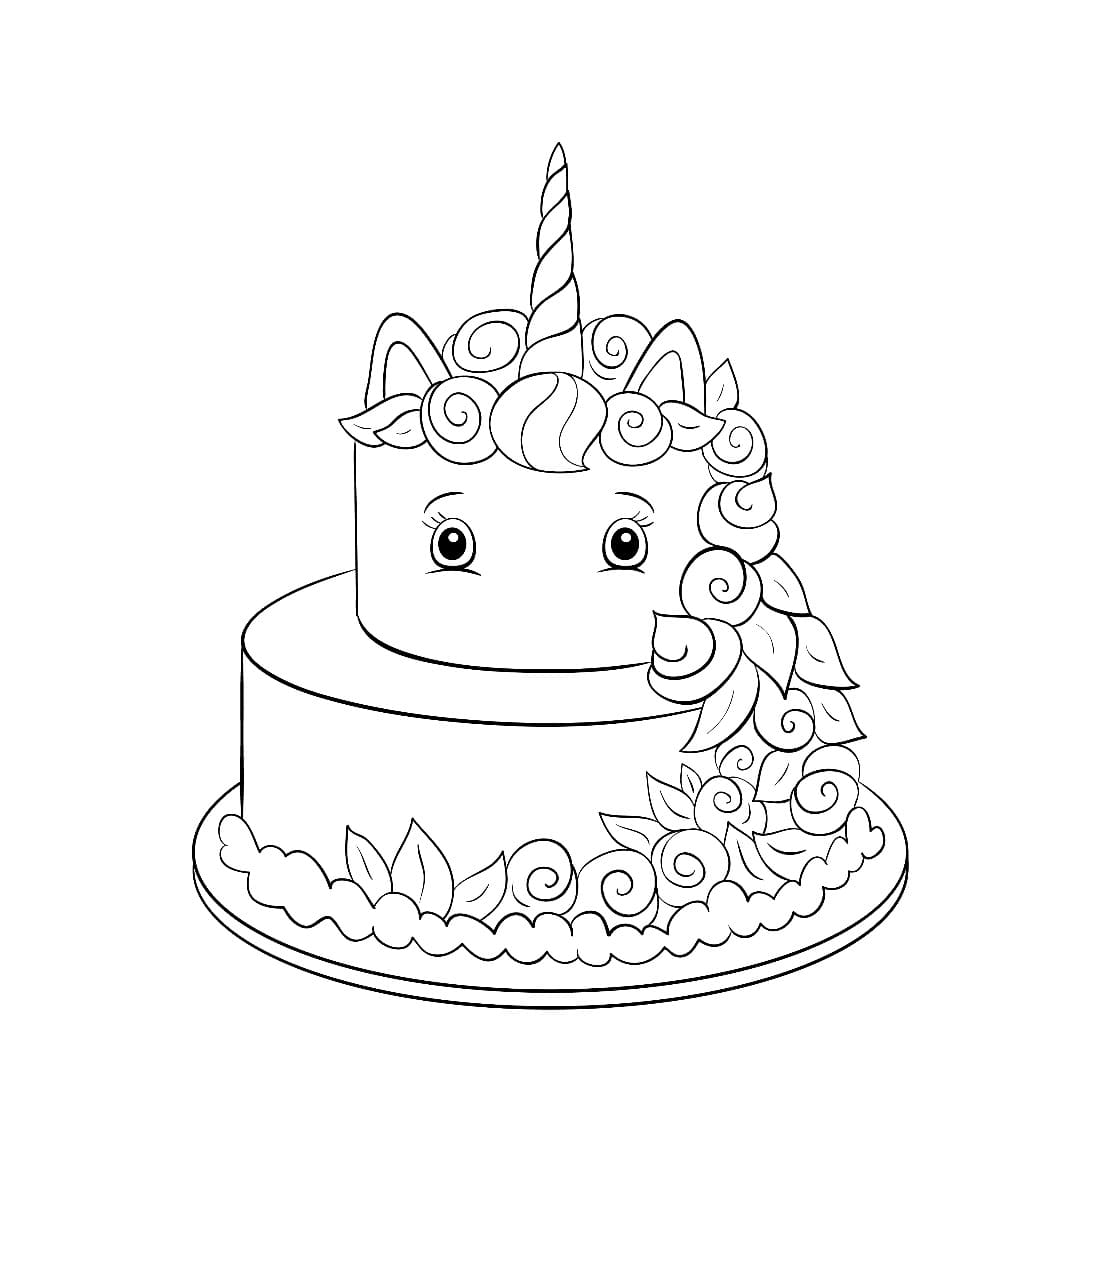 Ausmalbilder Einhorn Torte - Coloring and Drawing